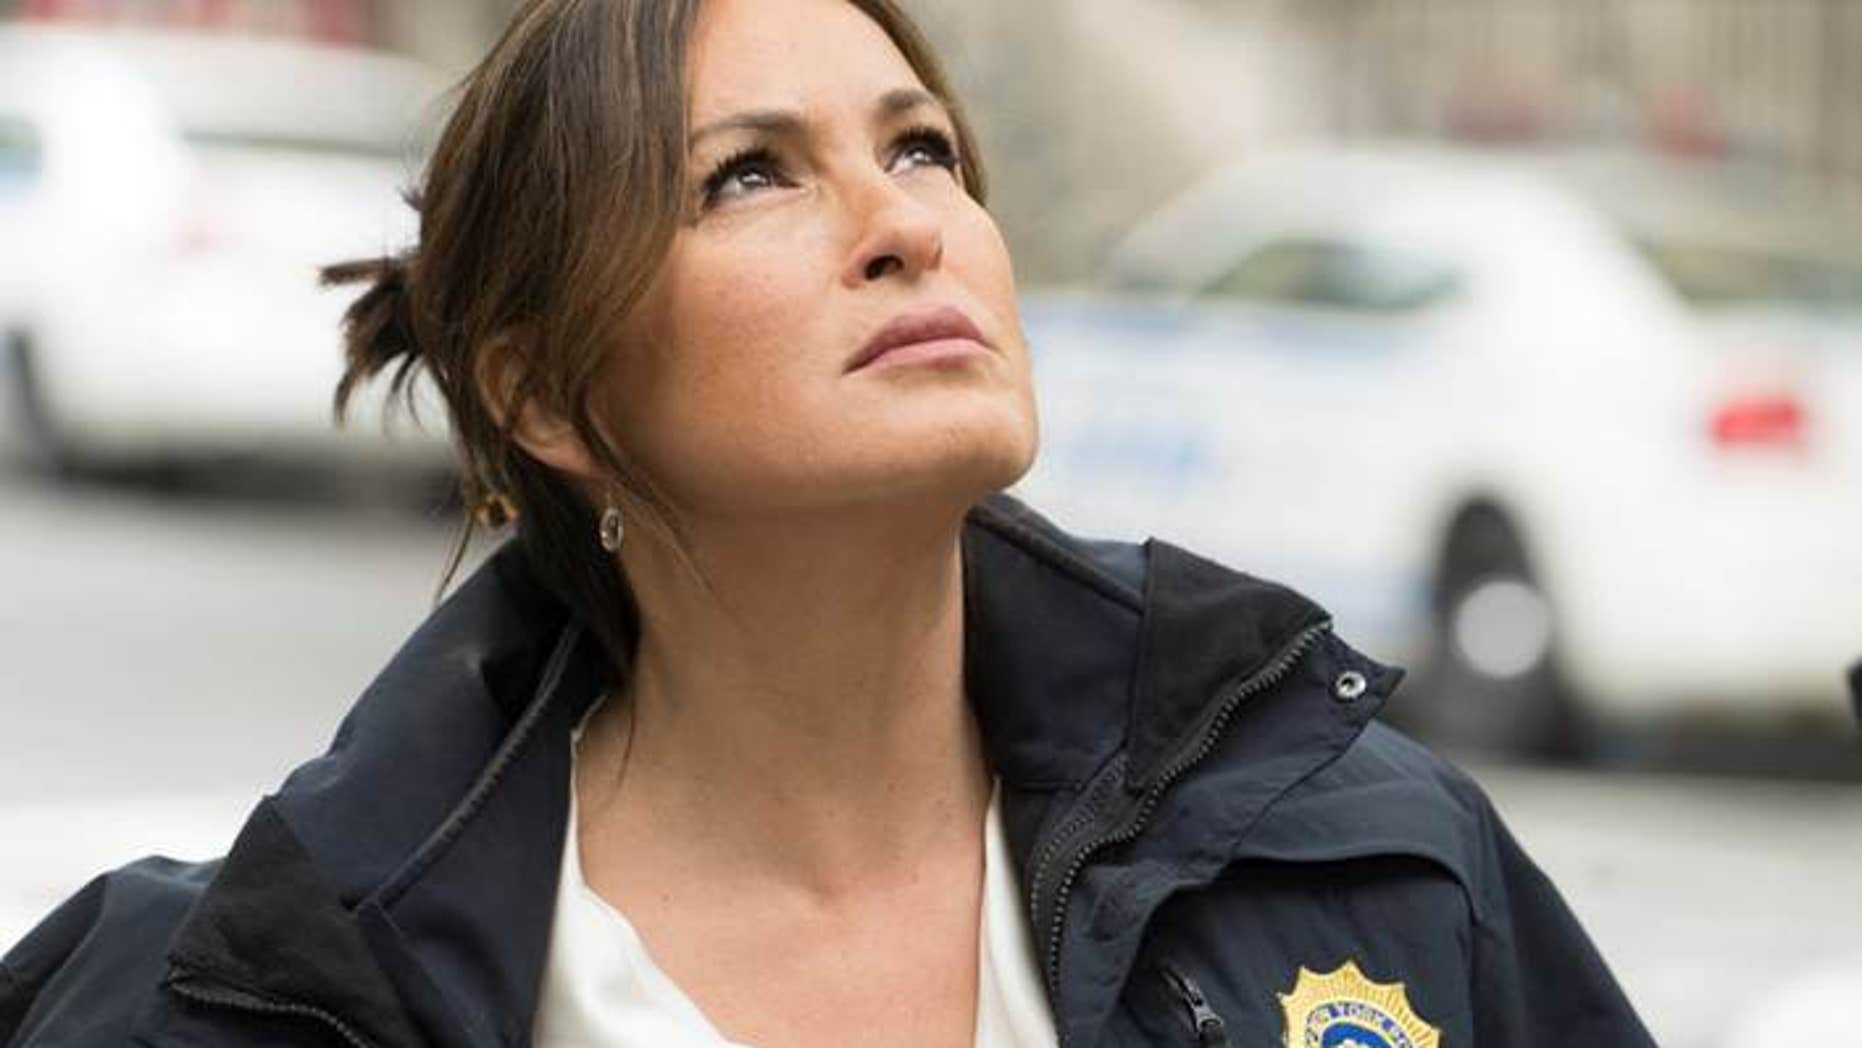 Mariska Hargitay as Lieutenant Olivia Benson on 'Law & Order: SVU'